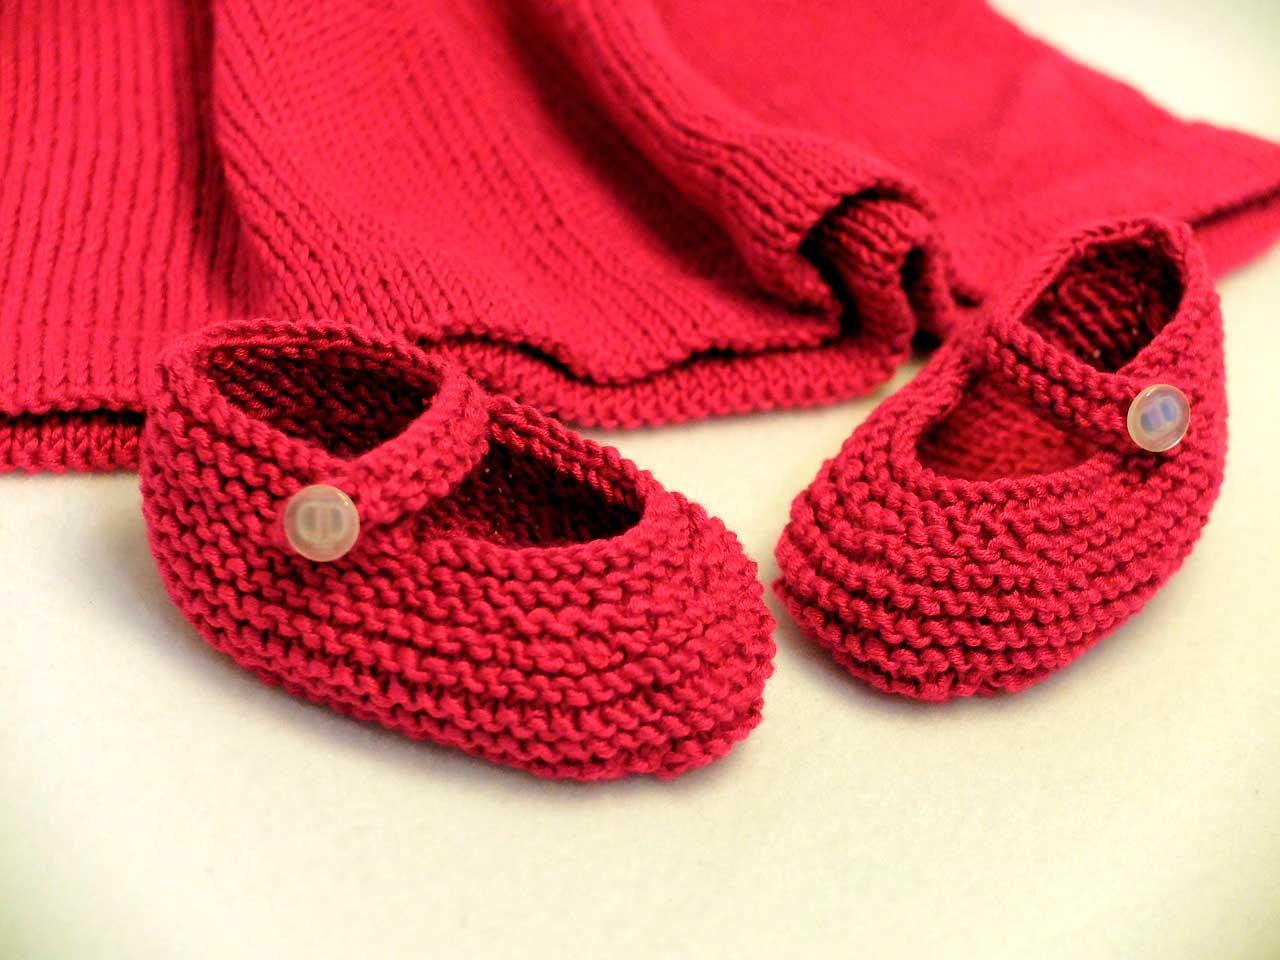 9ccd09610 Comprar ropa bebé hecha a mano en lana online •